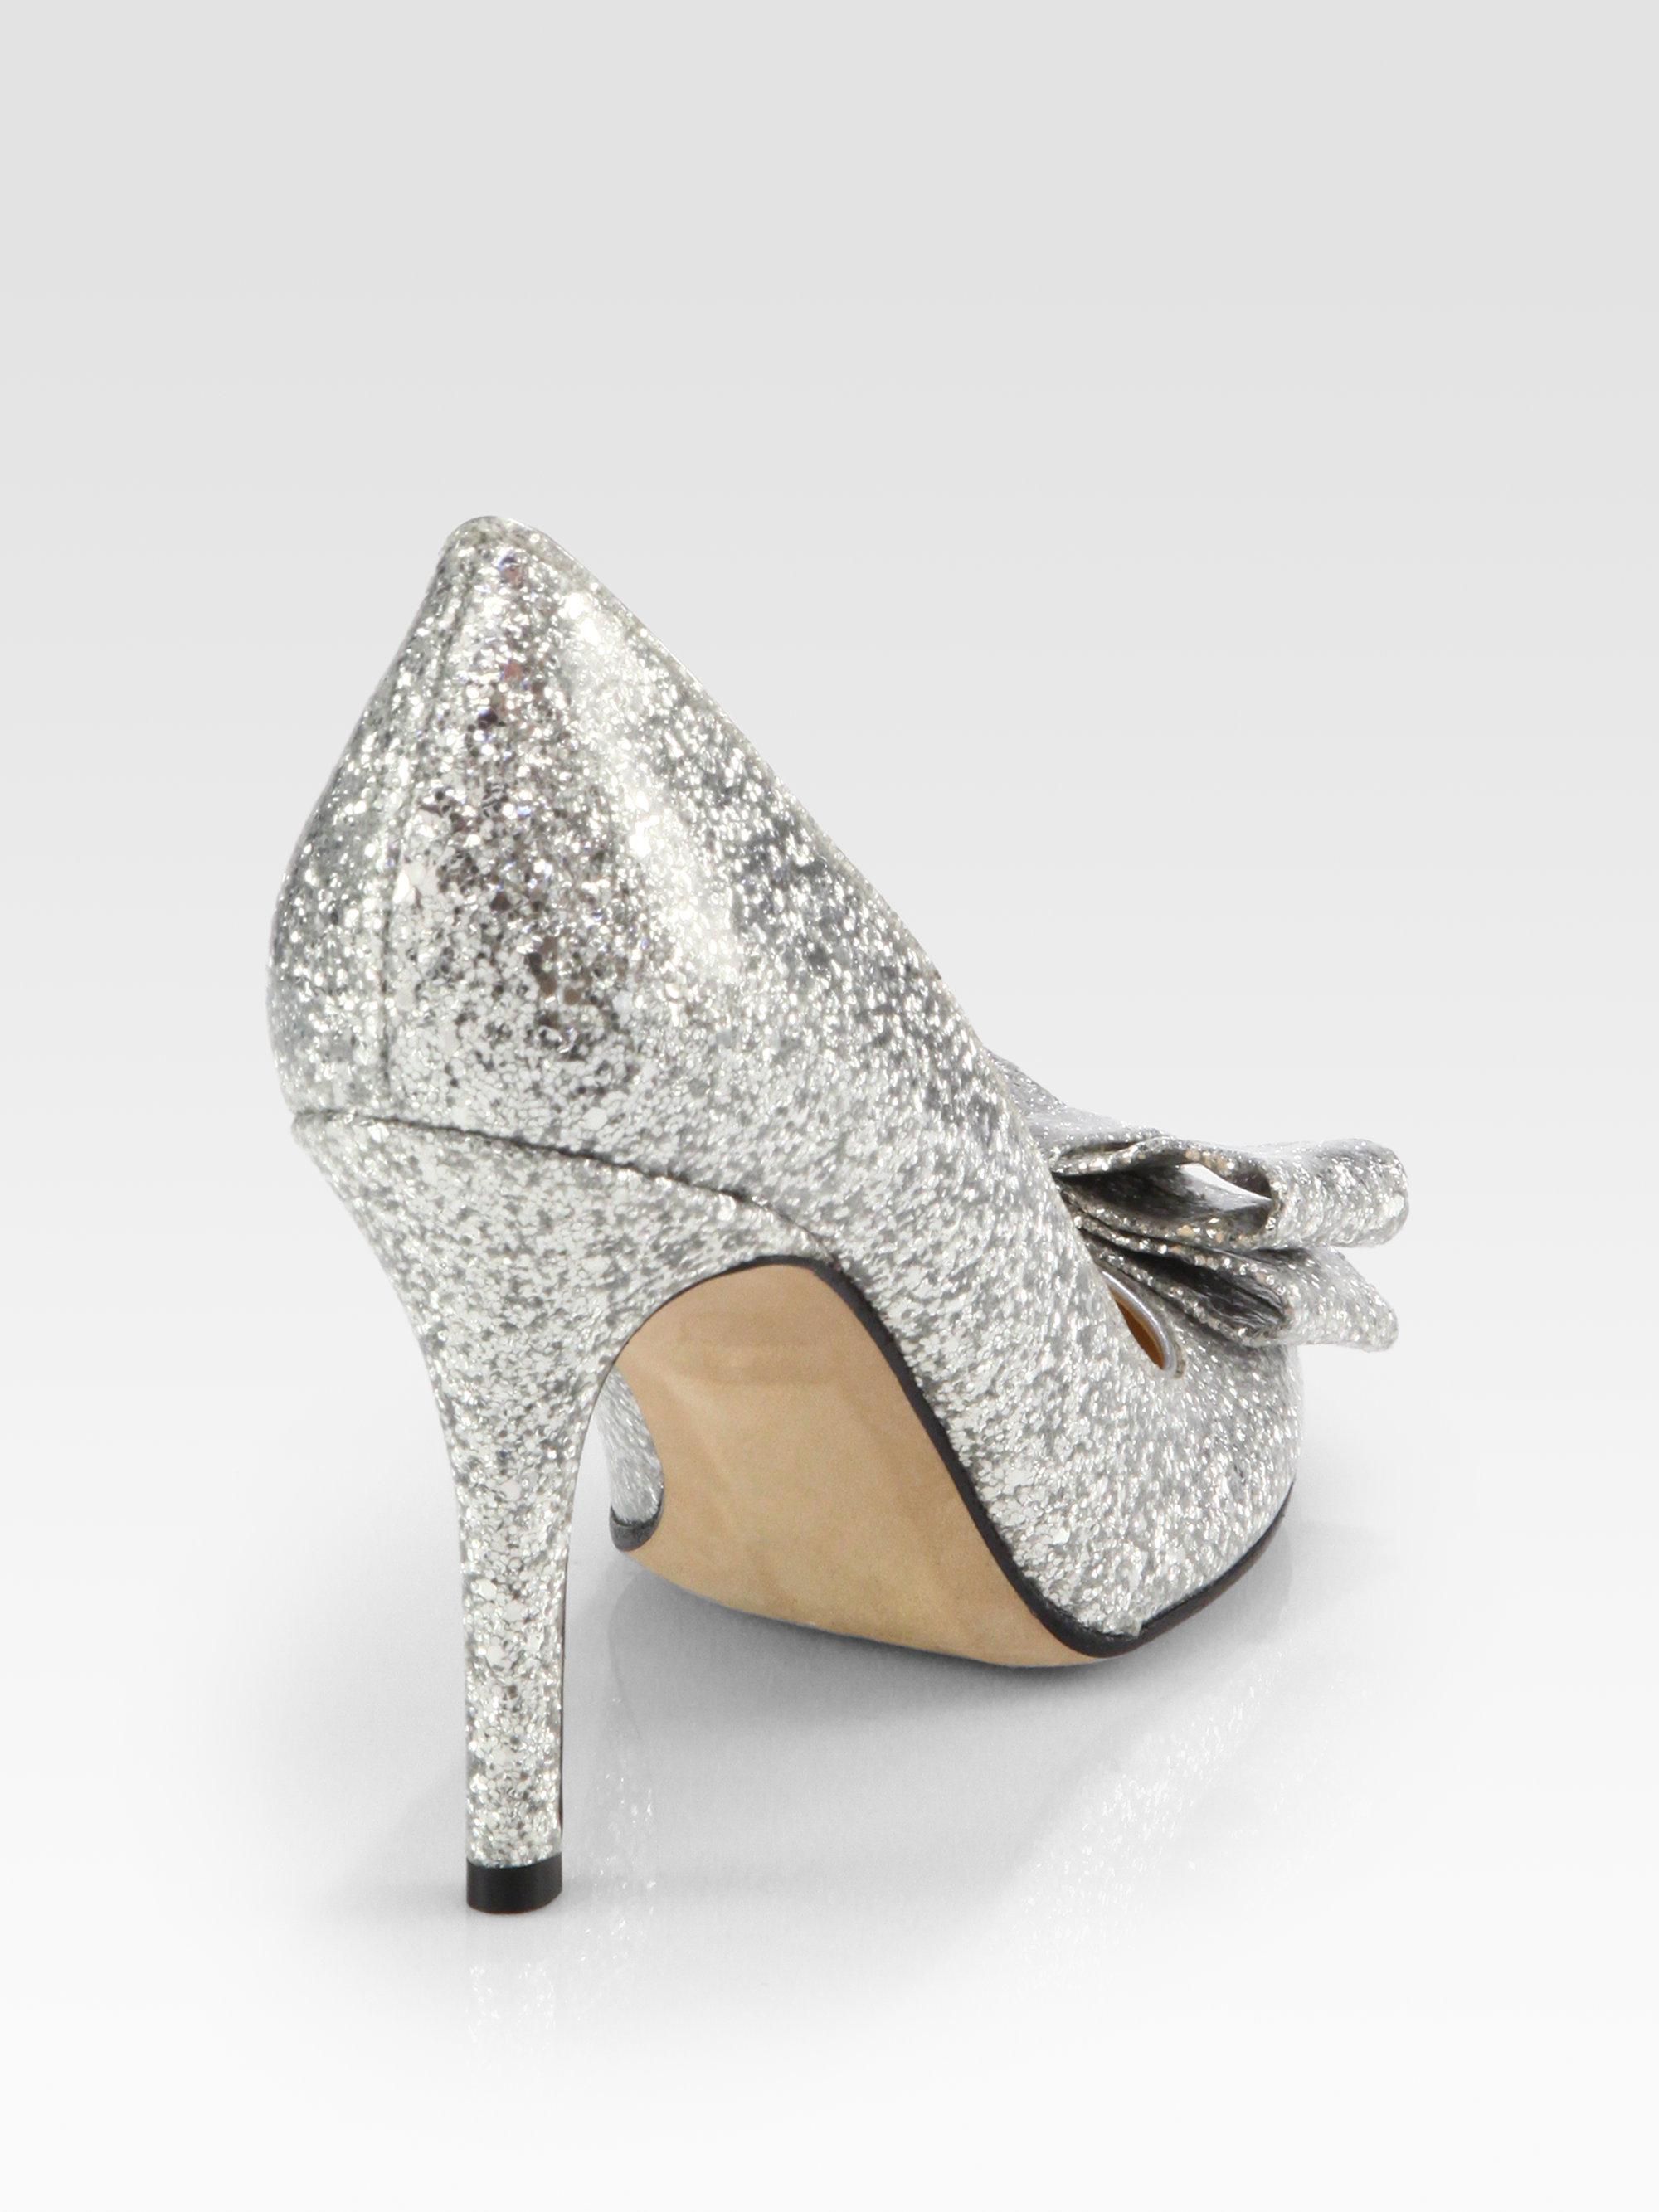 8d14b5cf6eb Lyst - Kate Spade Krysta Glittercoated Patent Leather Bow Pumps in ...